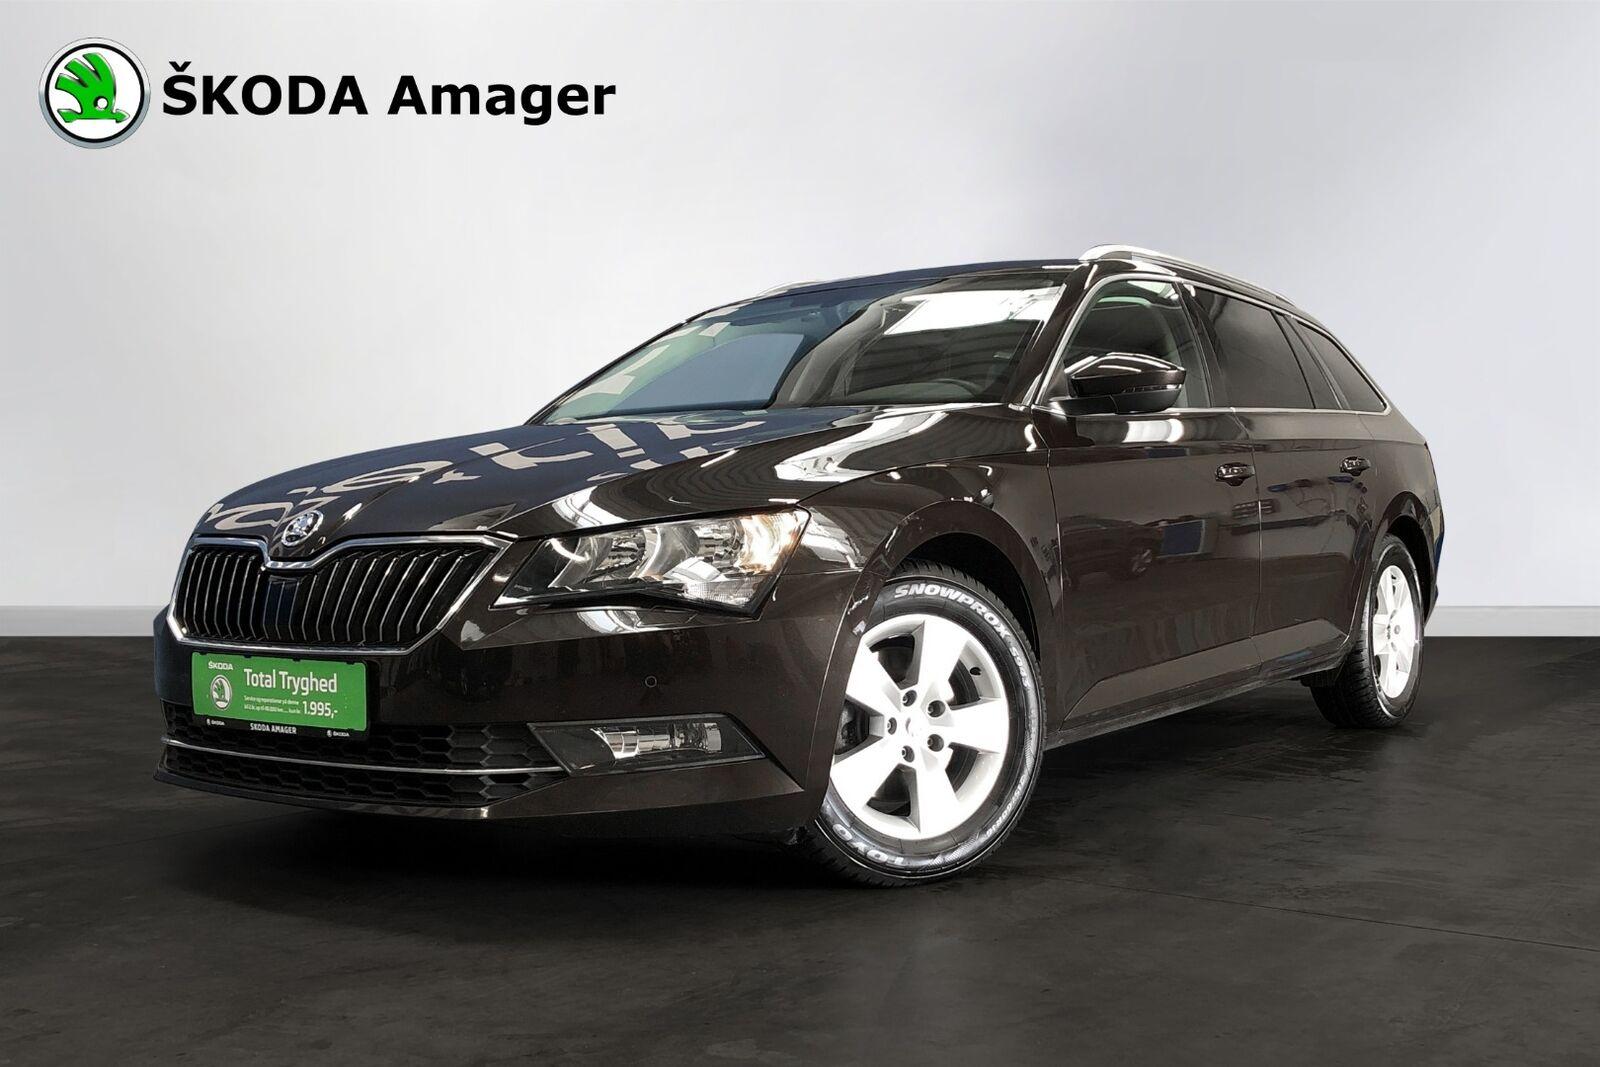 Skoda Superb 1,4 TSi 150 Ambition Combi DSG 5d - 279.900 kr.